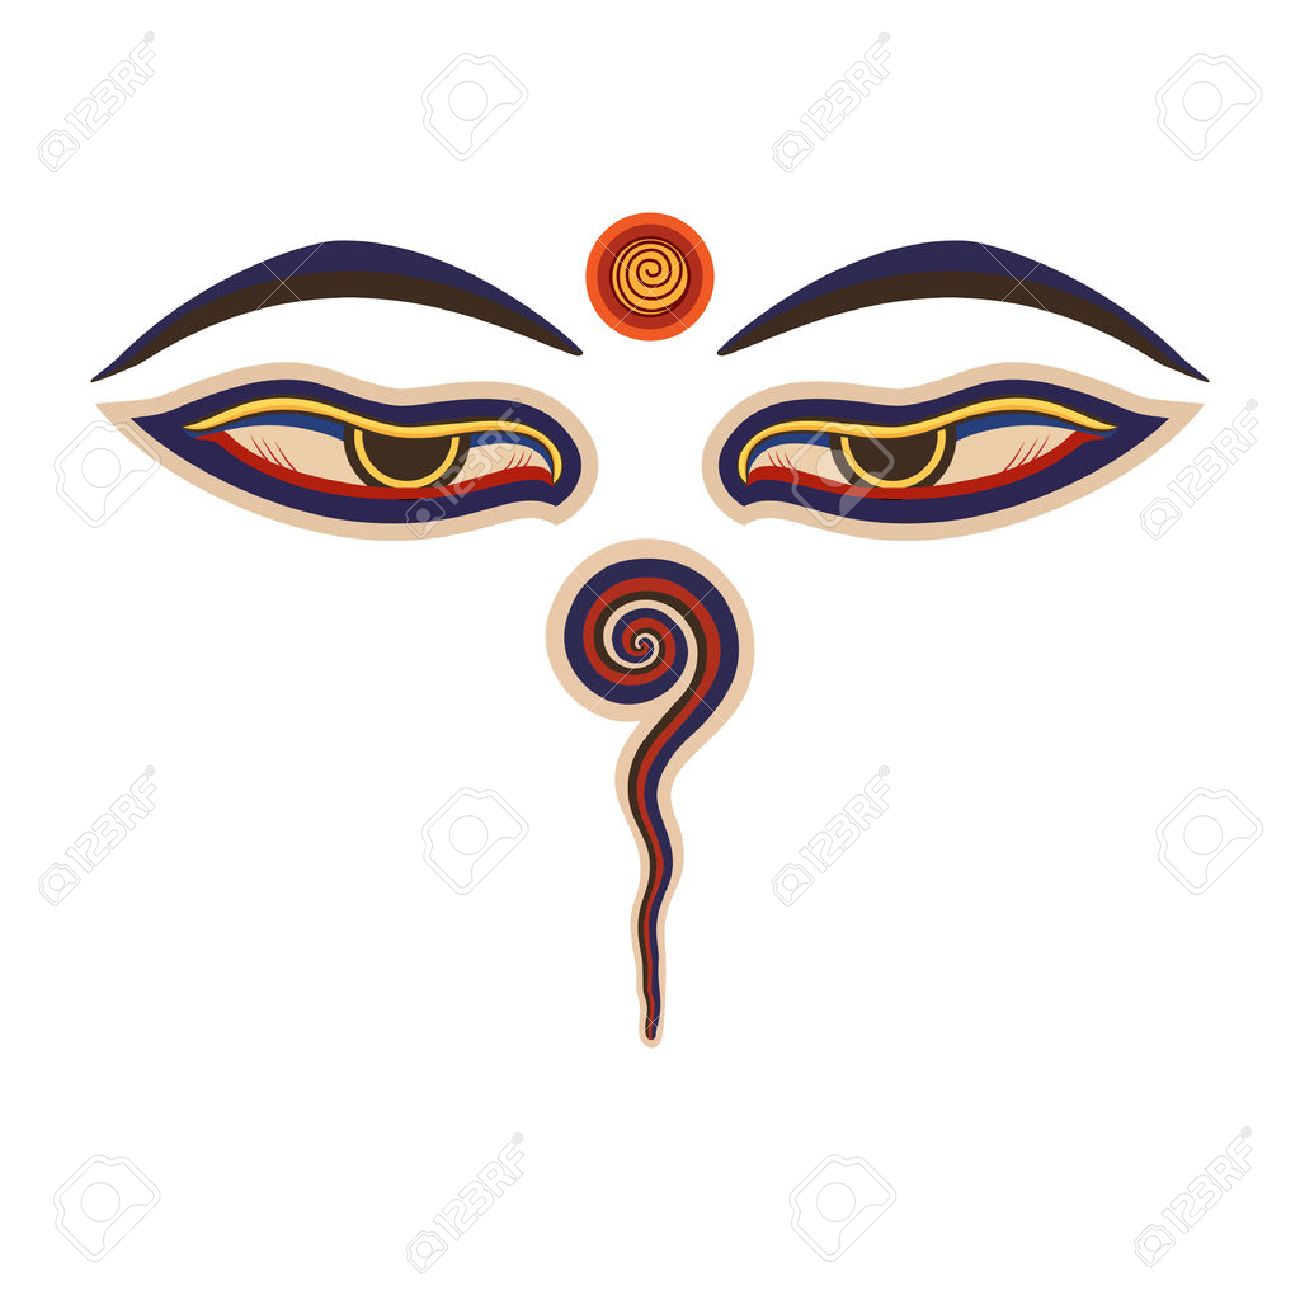 Buddha eyes royalty free cliparts vectors and stock illustration buddha eyes biocorpaavc Images